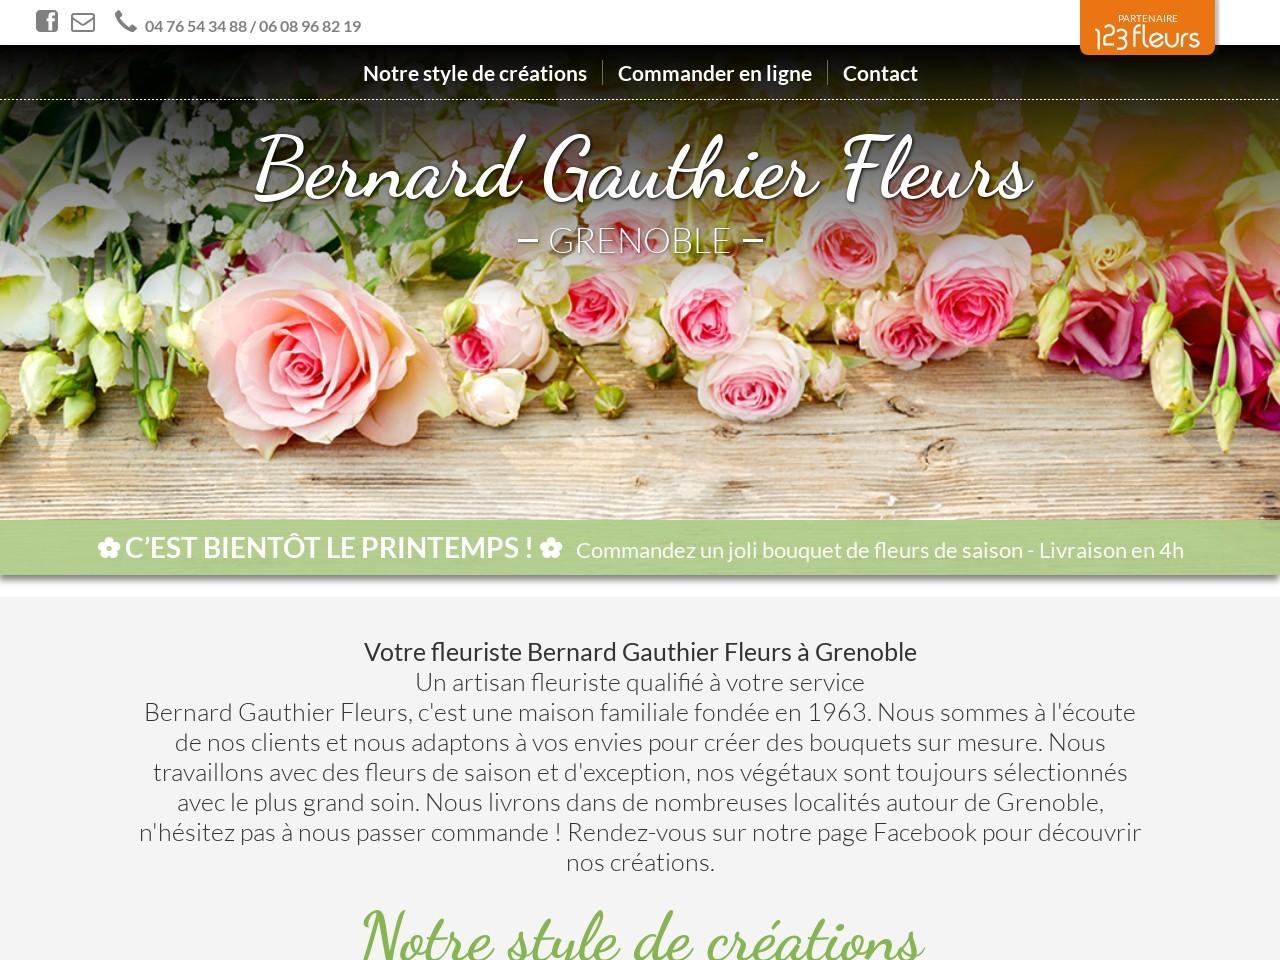 Site fleuriste Bernard Gauthier Fleurs - 123fleurs